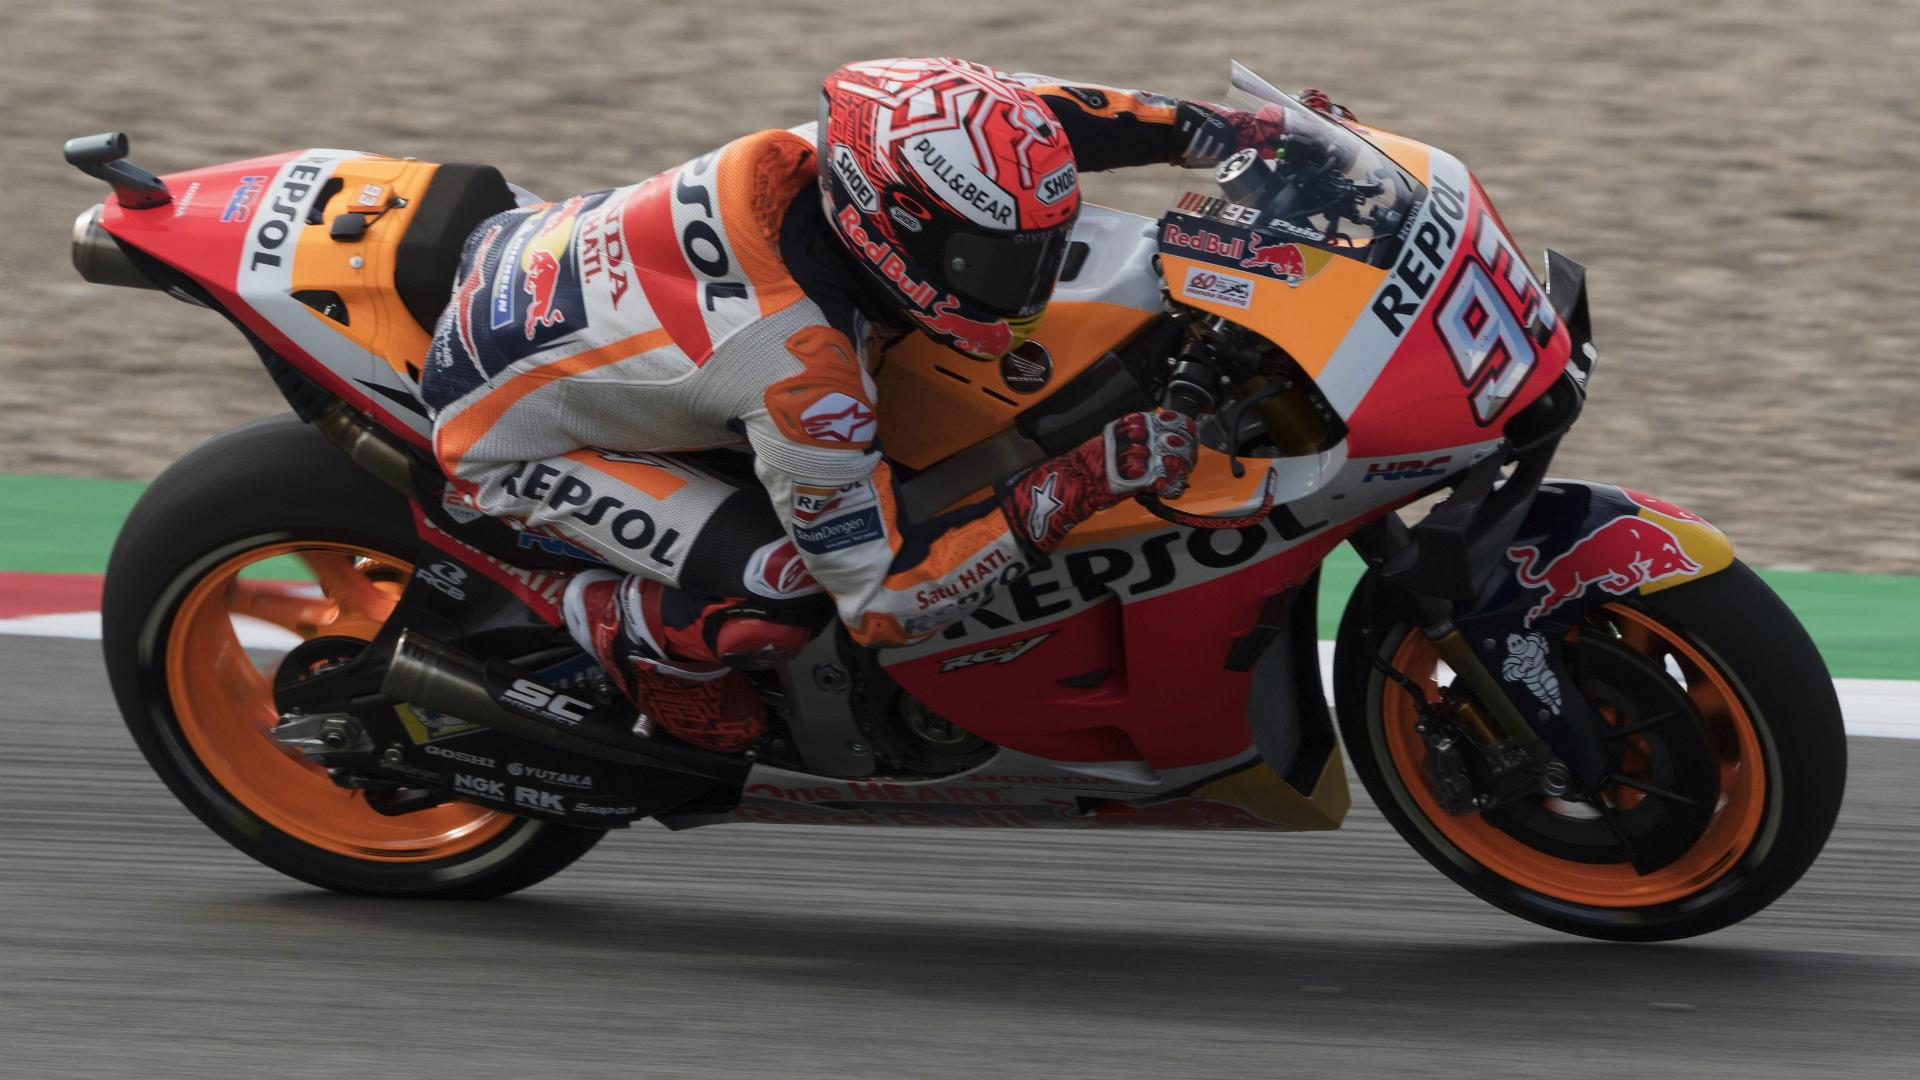 MotoGP Raceweek: Marquez out of position as Yamaha set Dutch TT pace